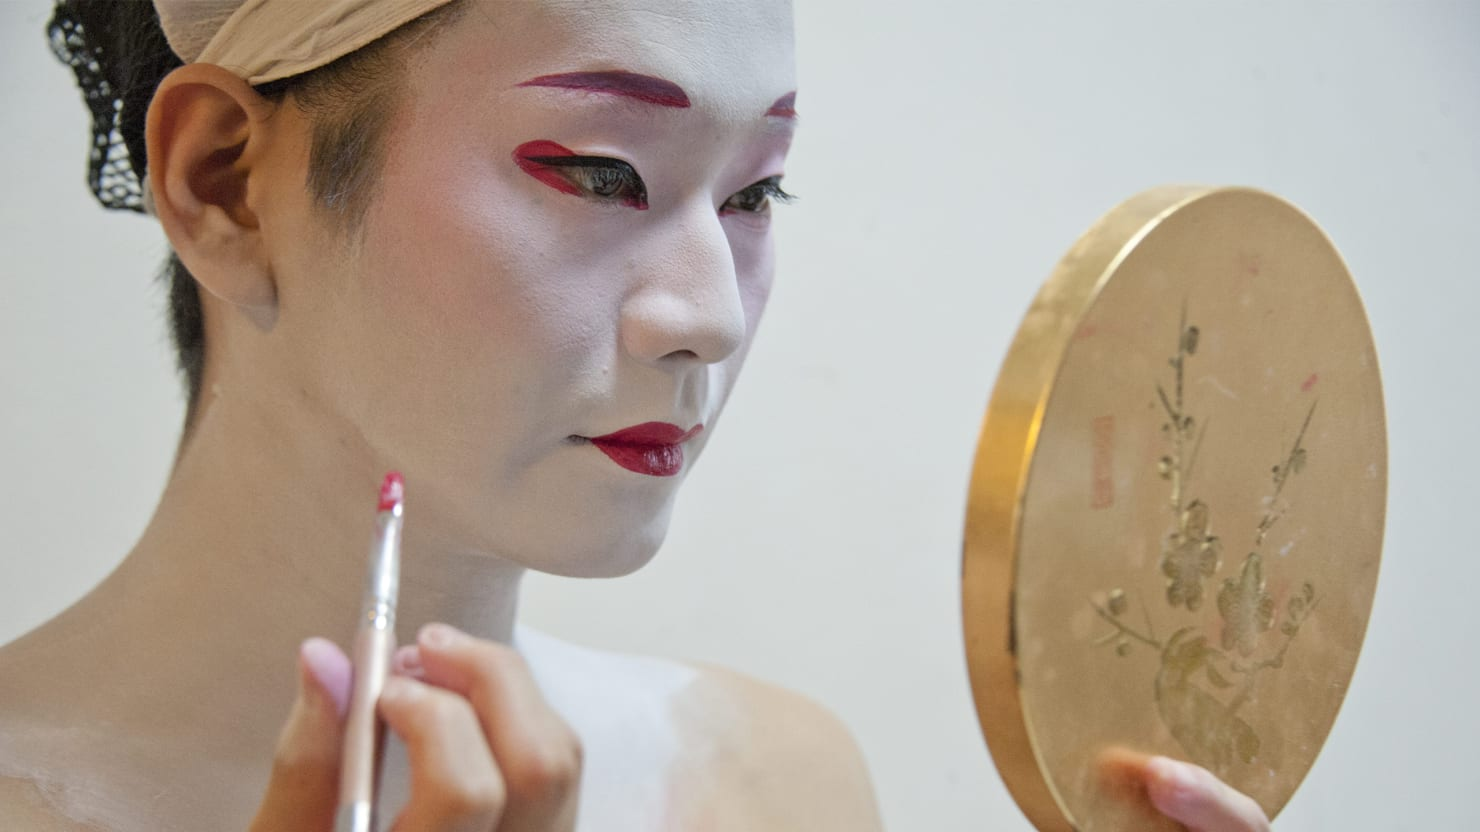 Feminine japanese men makeup